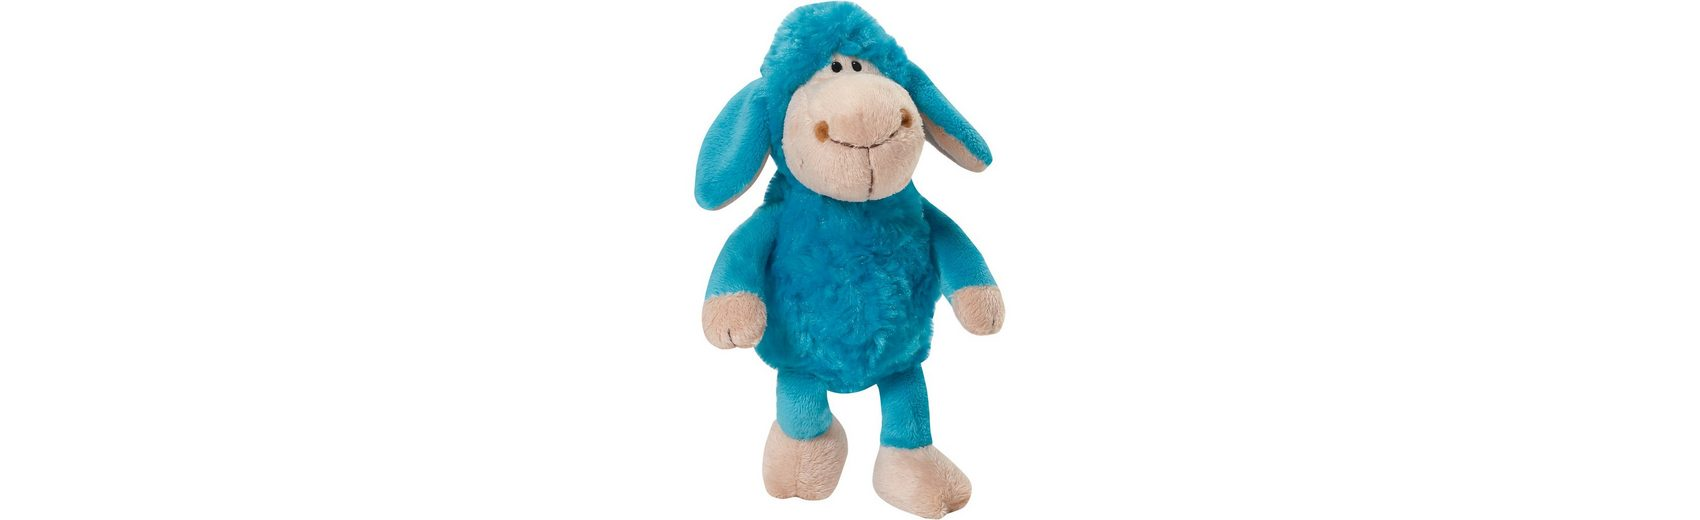 NICI Jolly Mäh Schlenker blau 20cm (39259)